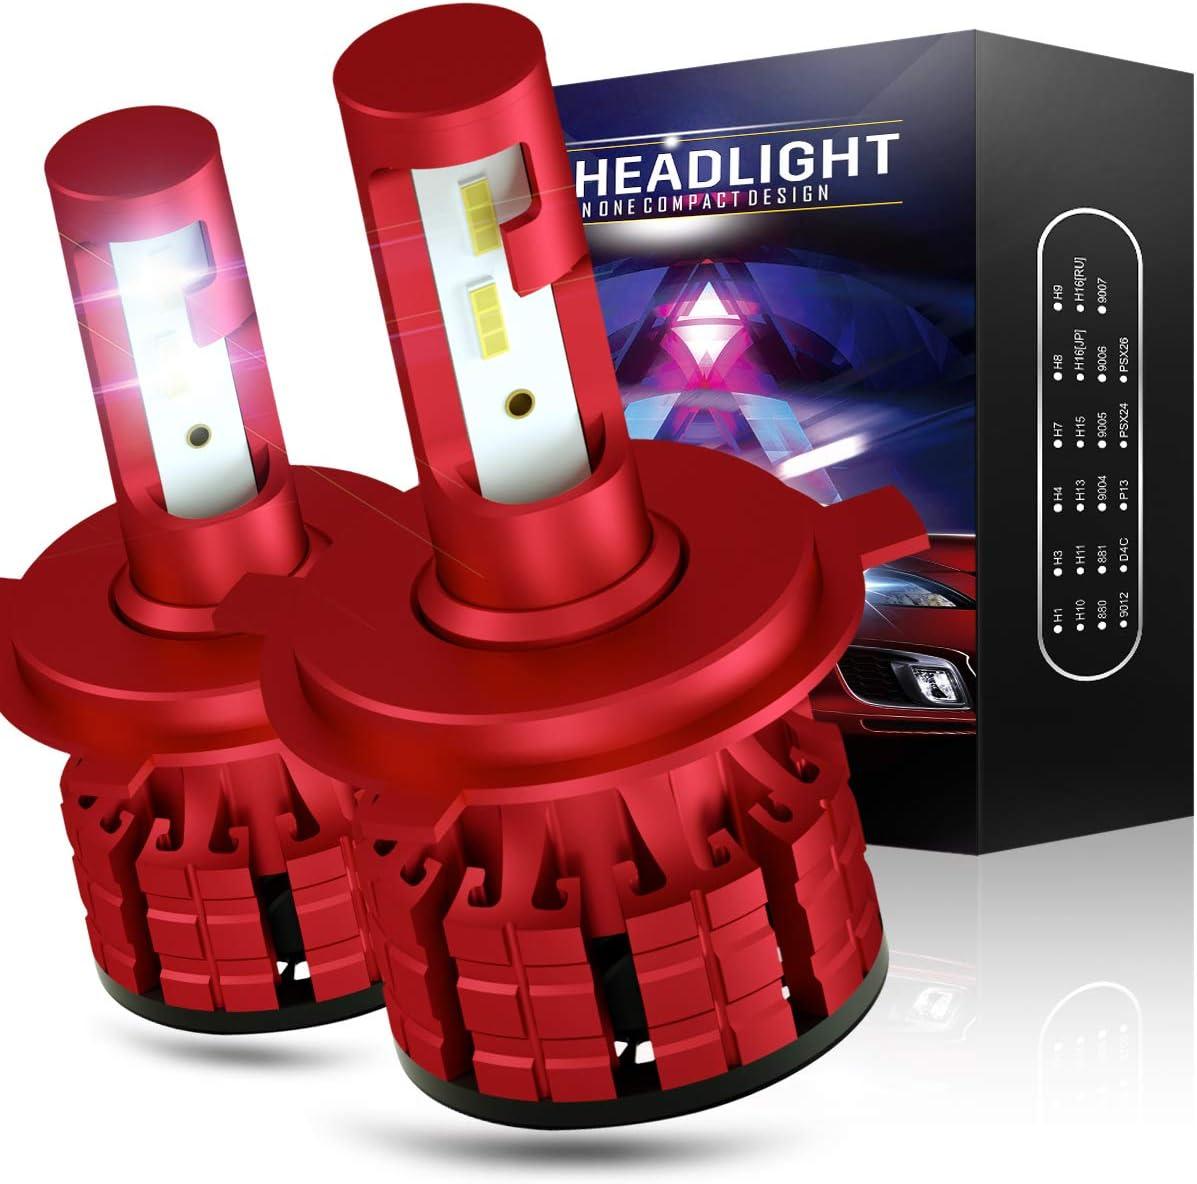 2 Pieces Wayrank H1 LED Bulb 10800LM Auto bulbs 60W 12V 6000K White